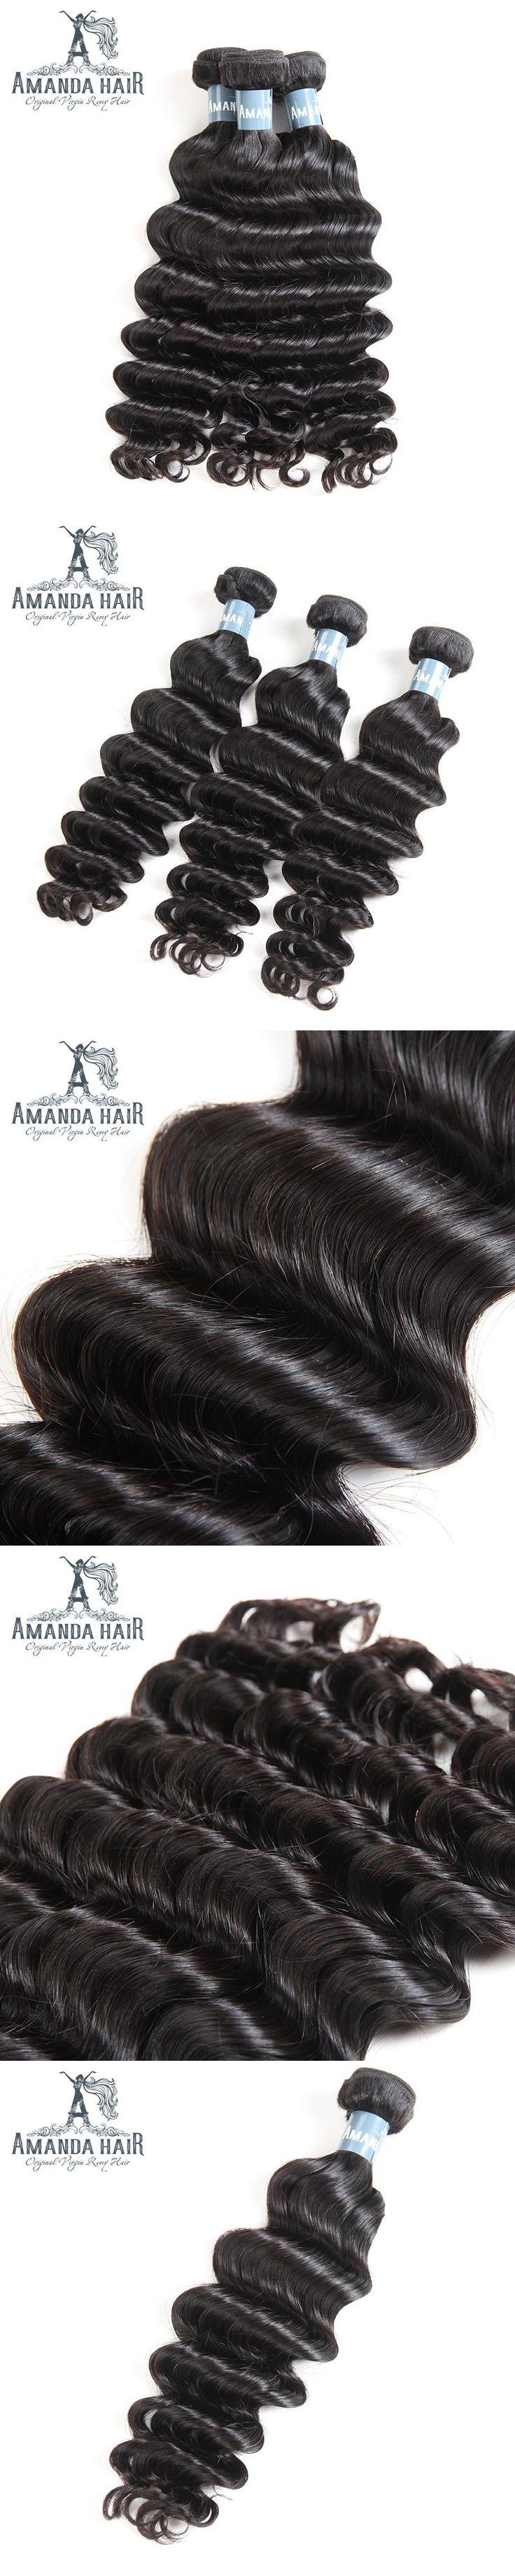 Amanda Malaysian Loose Deep Wave Hair Extension For Salon Deep Loose Wave Bundles Virgin Human Hair 1PC Malaysian Hair Weave